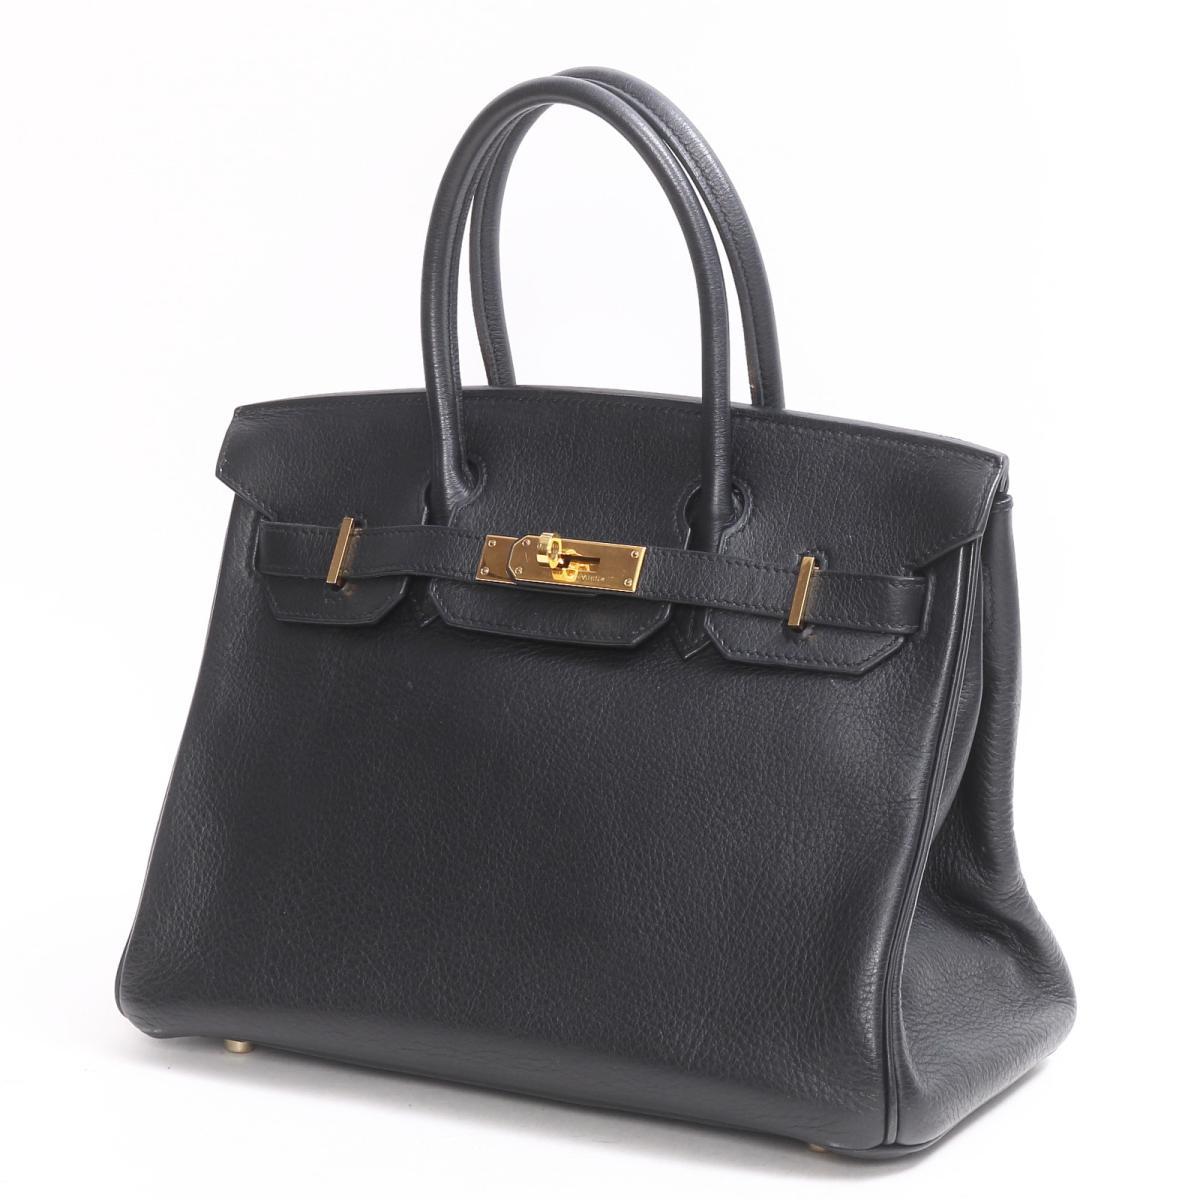 47e4e804c0 Hermes Birkin 30 handbag bag lady strike Lyon Clement s black (metal  fittings  gold)